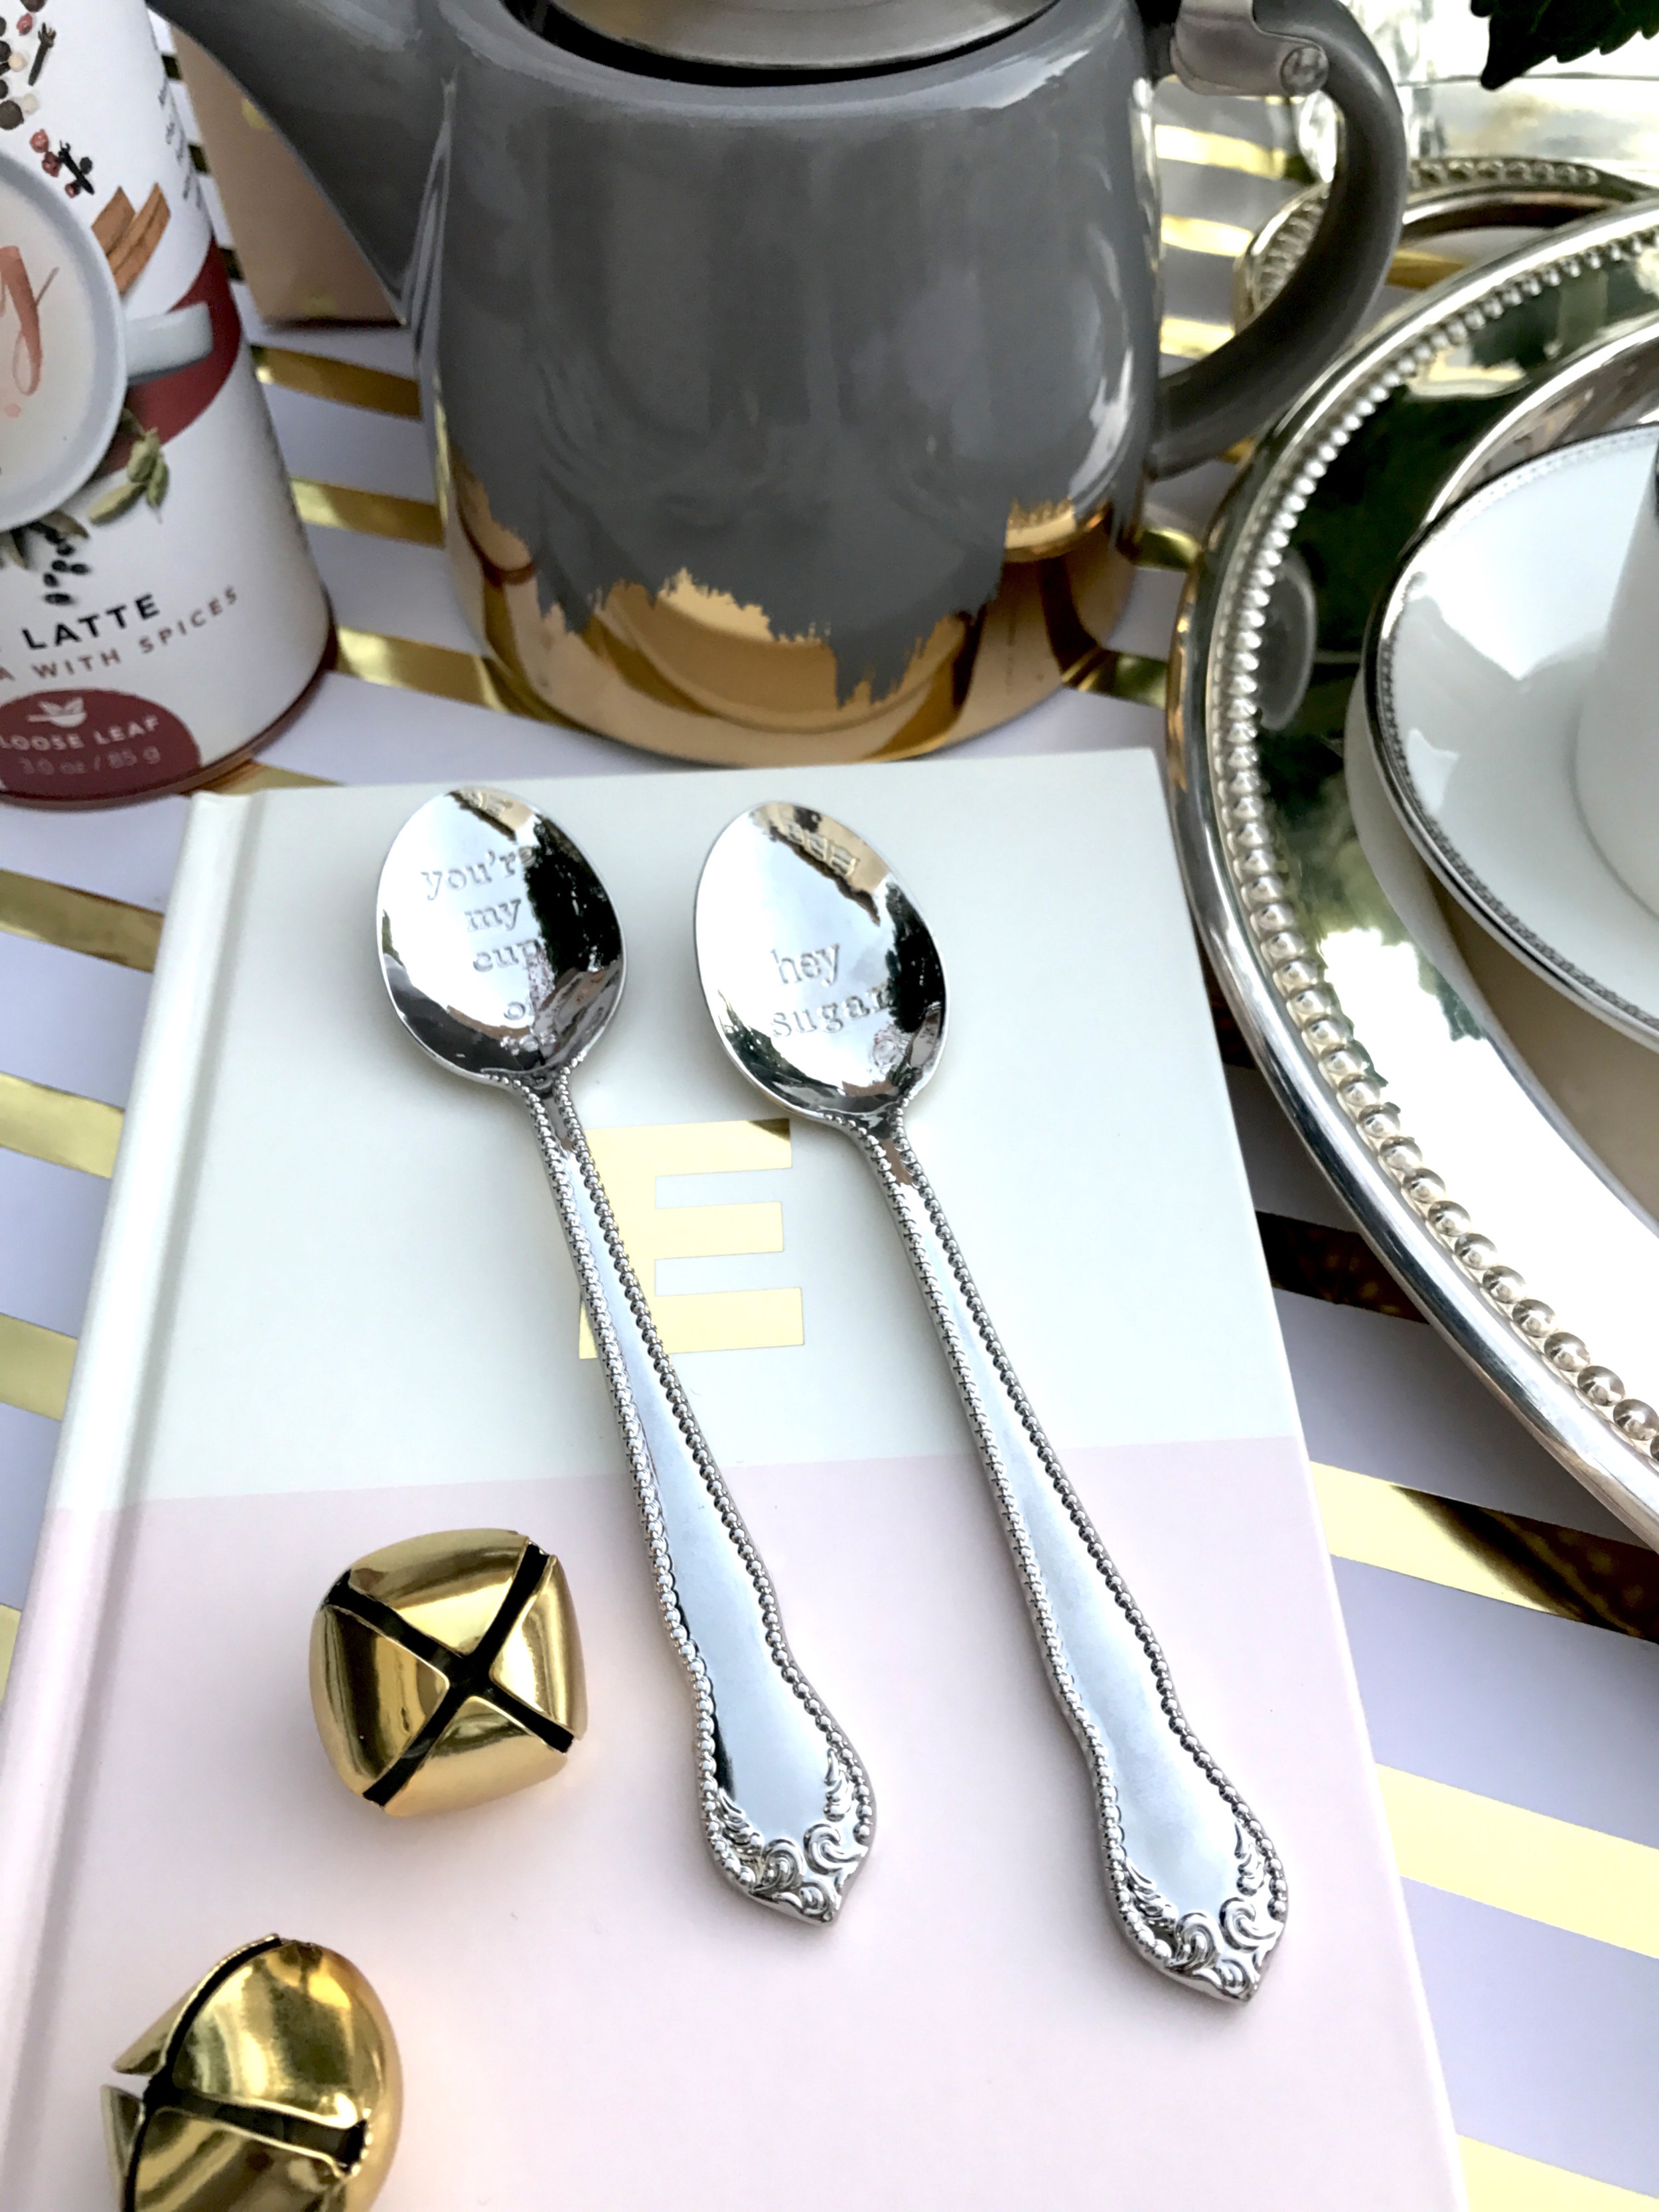 Hostess Gifts - Sugar spoons